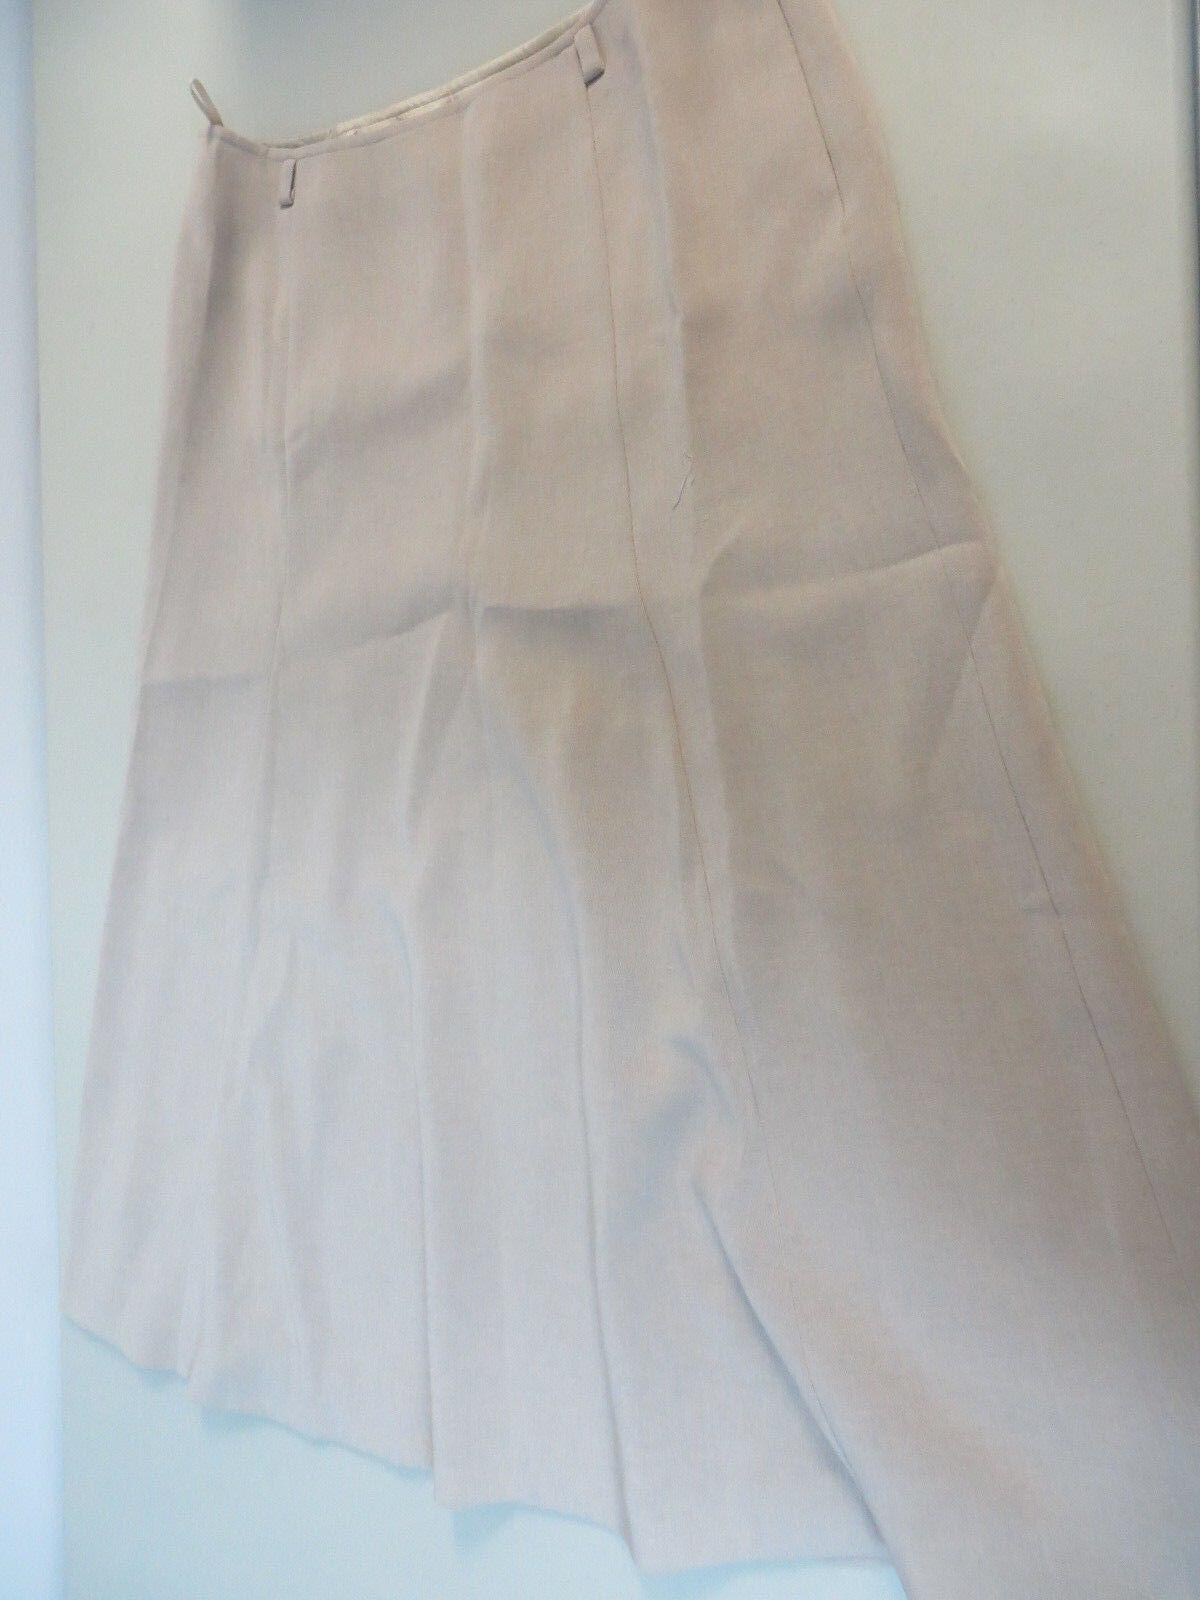 MAX MARA 8 triacetate polyester A-line panel below knee skirt tan